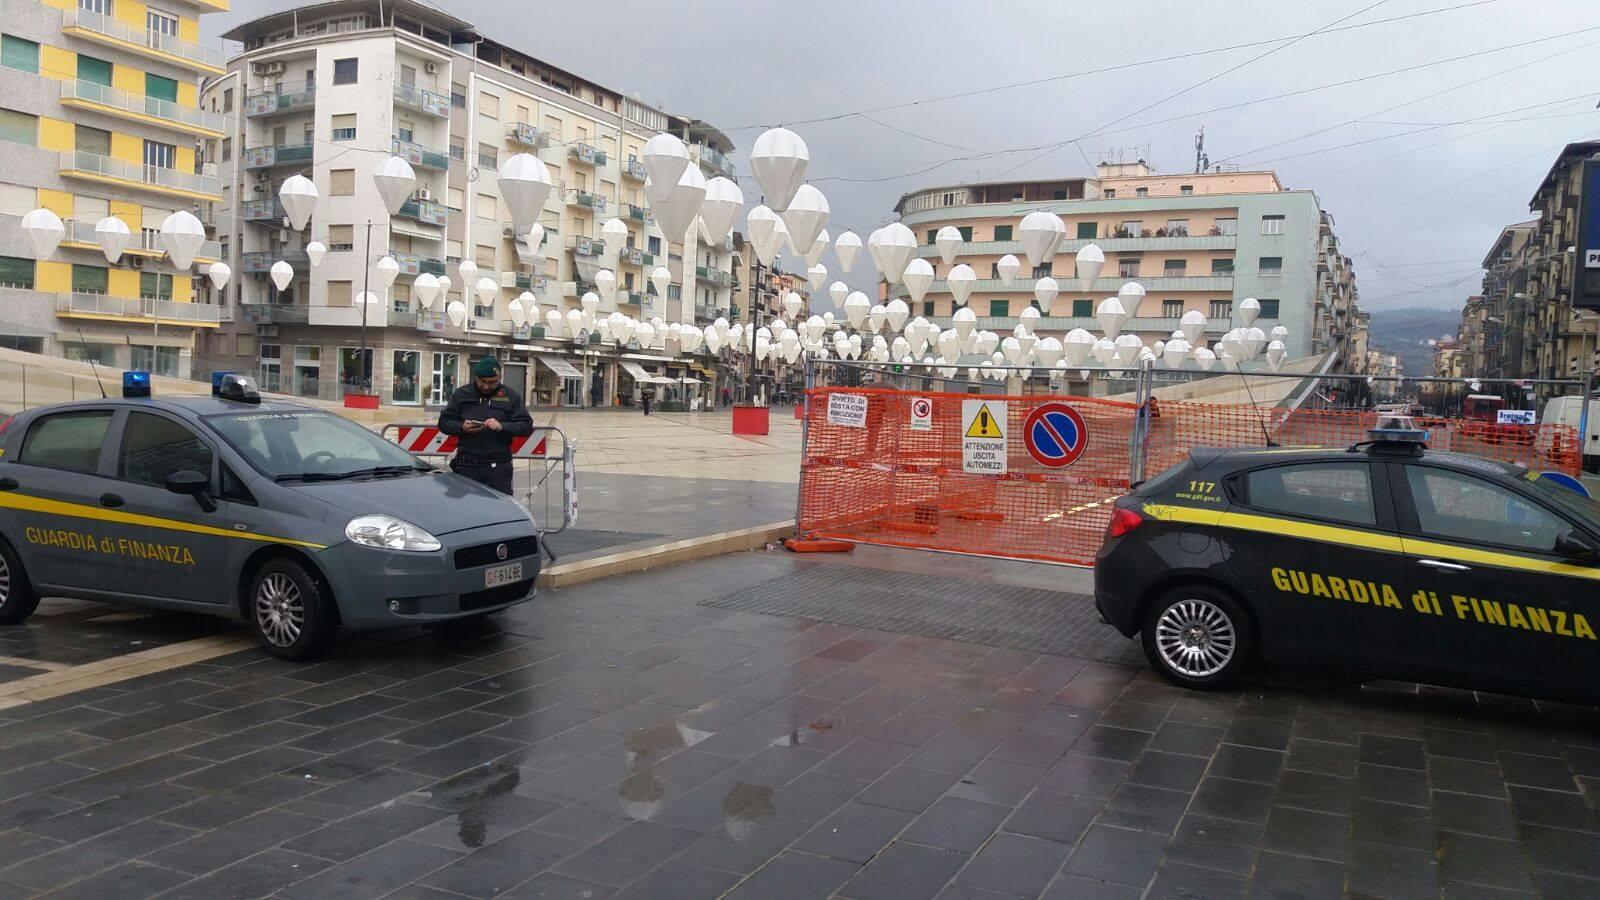 Piazza Bilotti Finanza